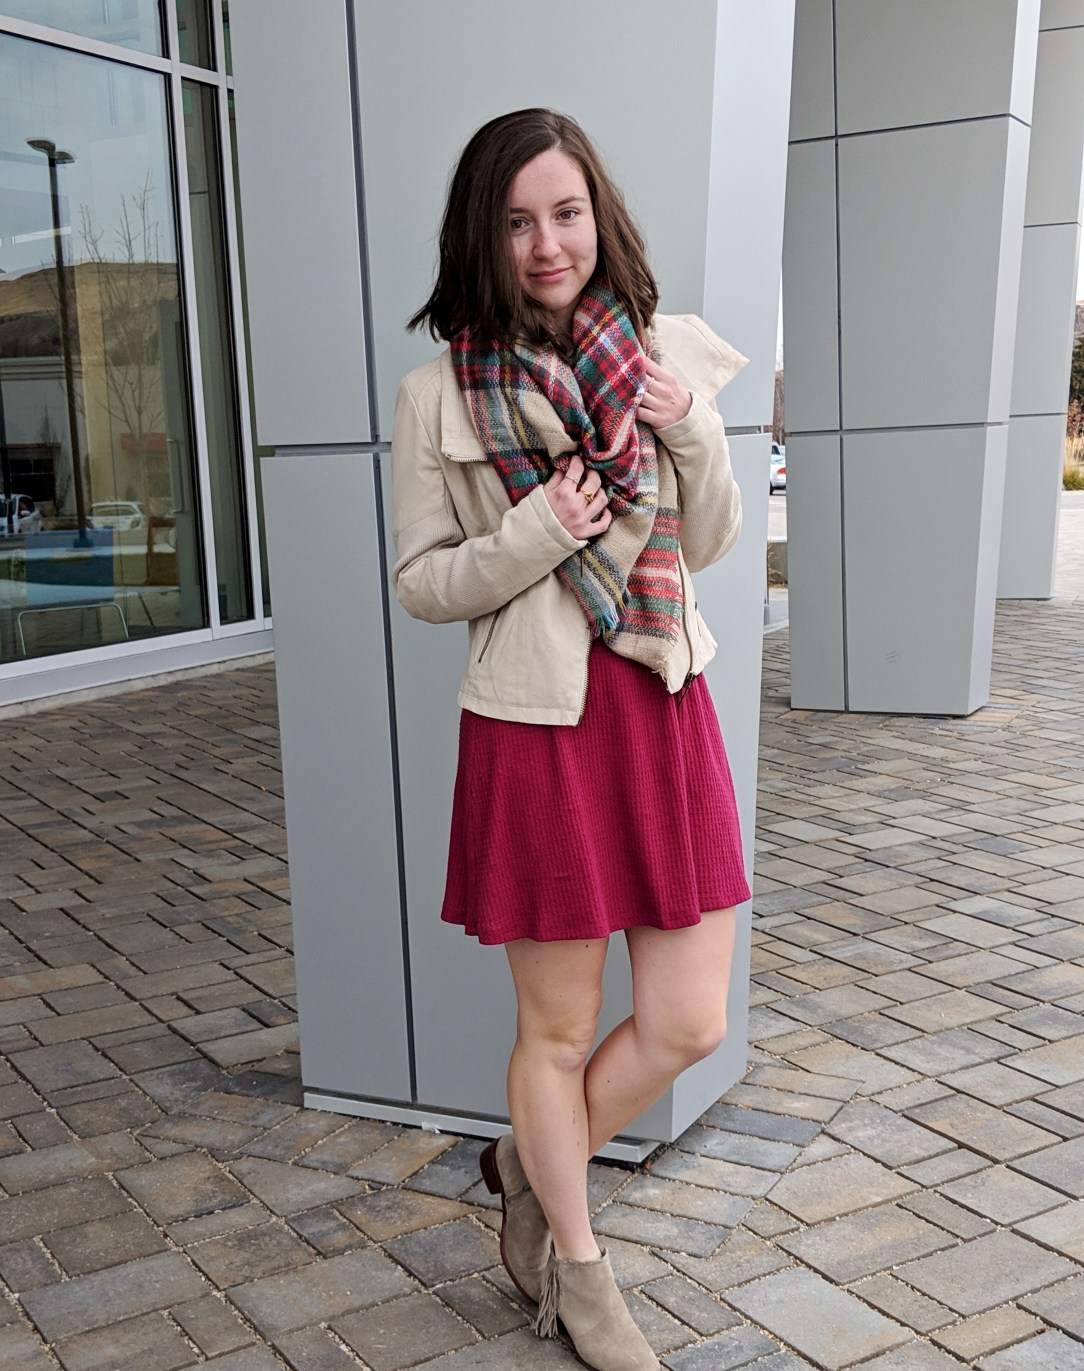 idaho fashion blogger teen blogger